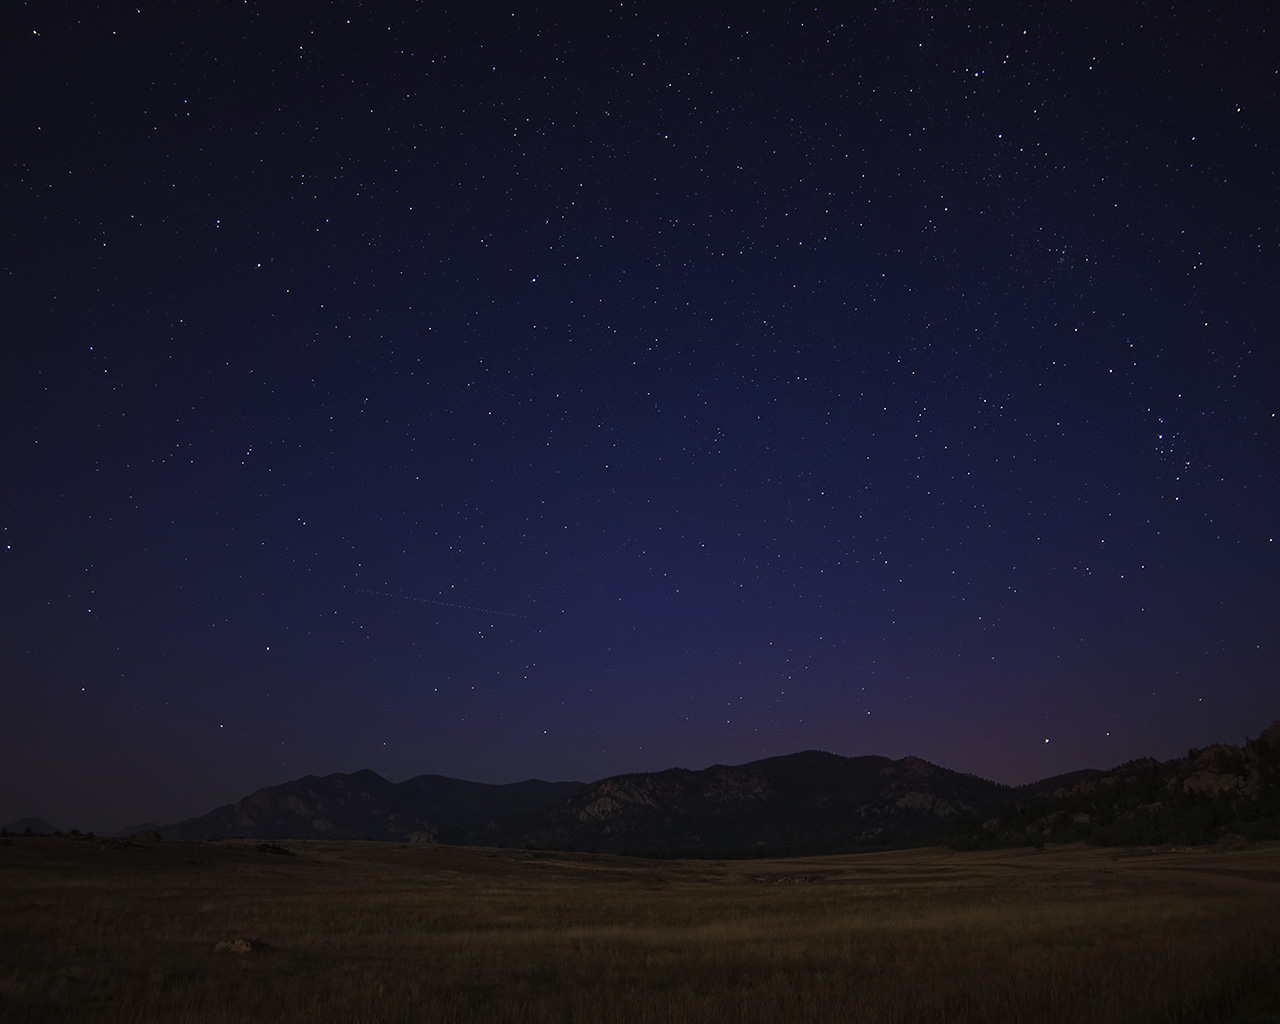 night essay starry night essay